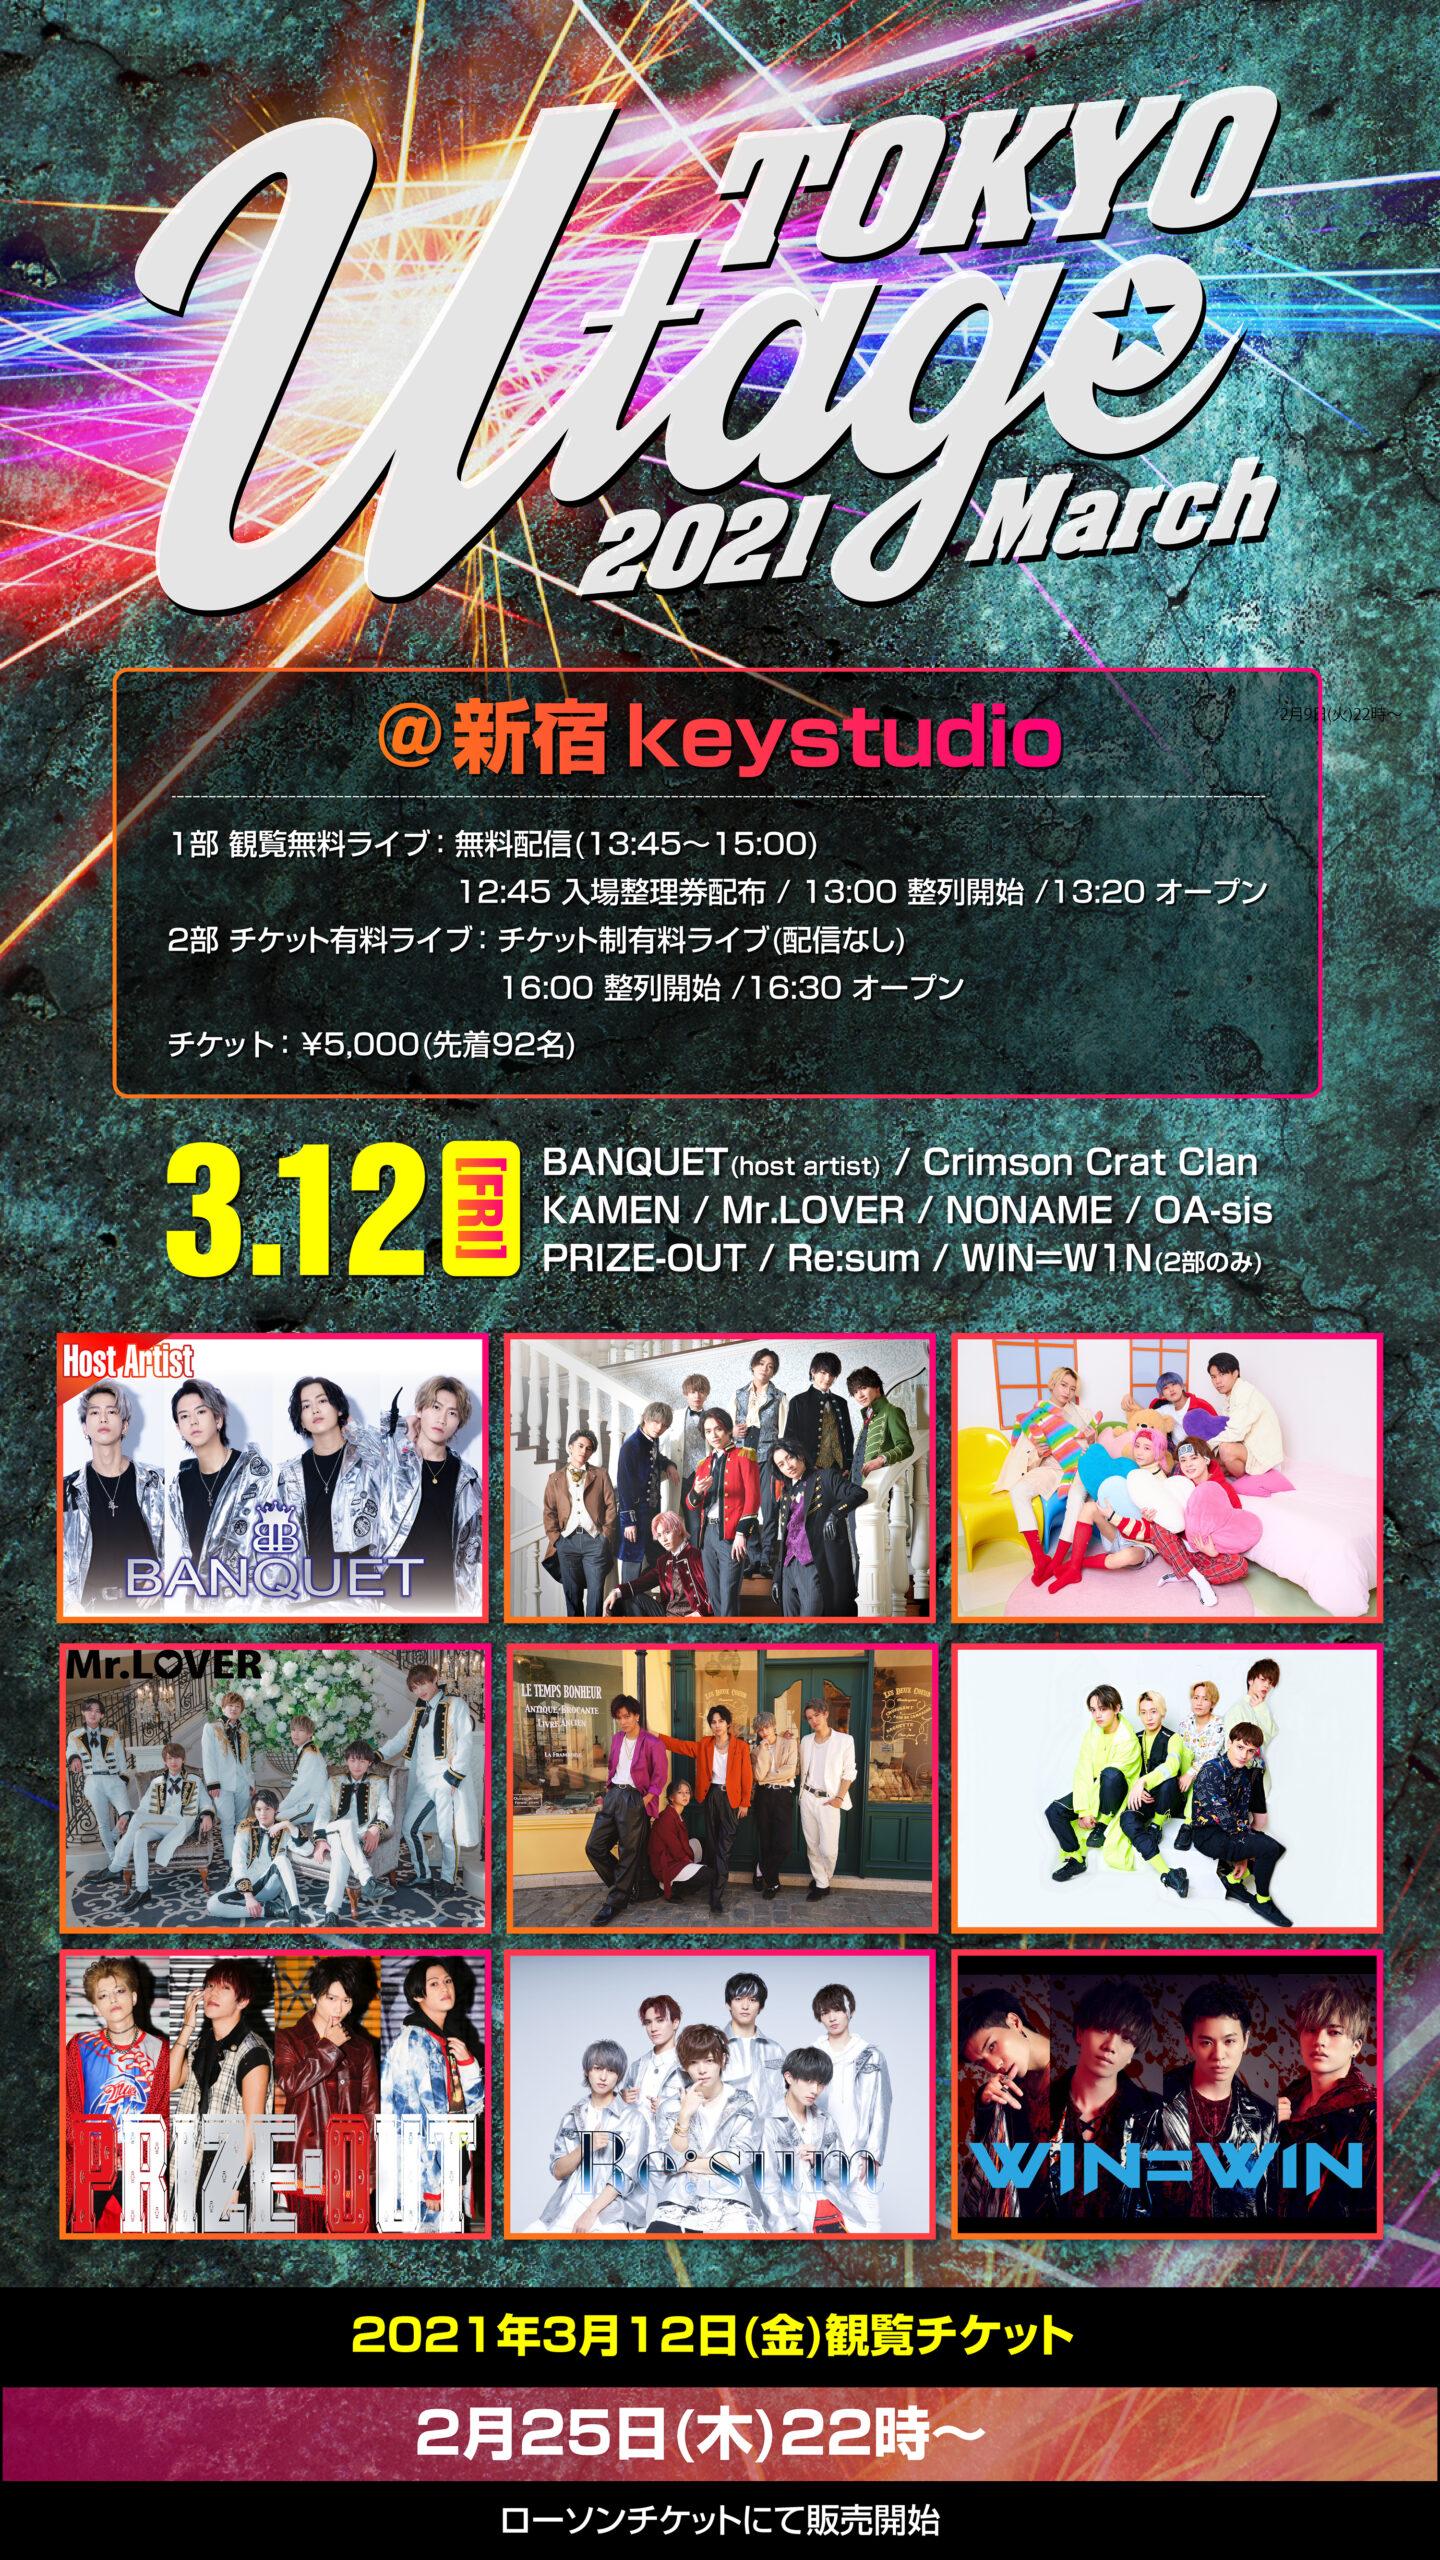 Utage☆2021 March